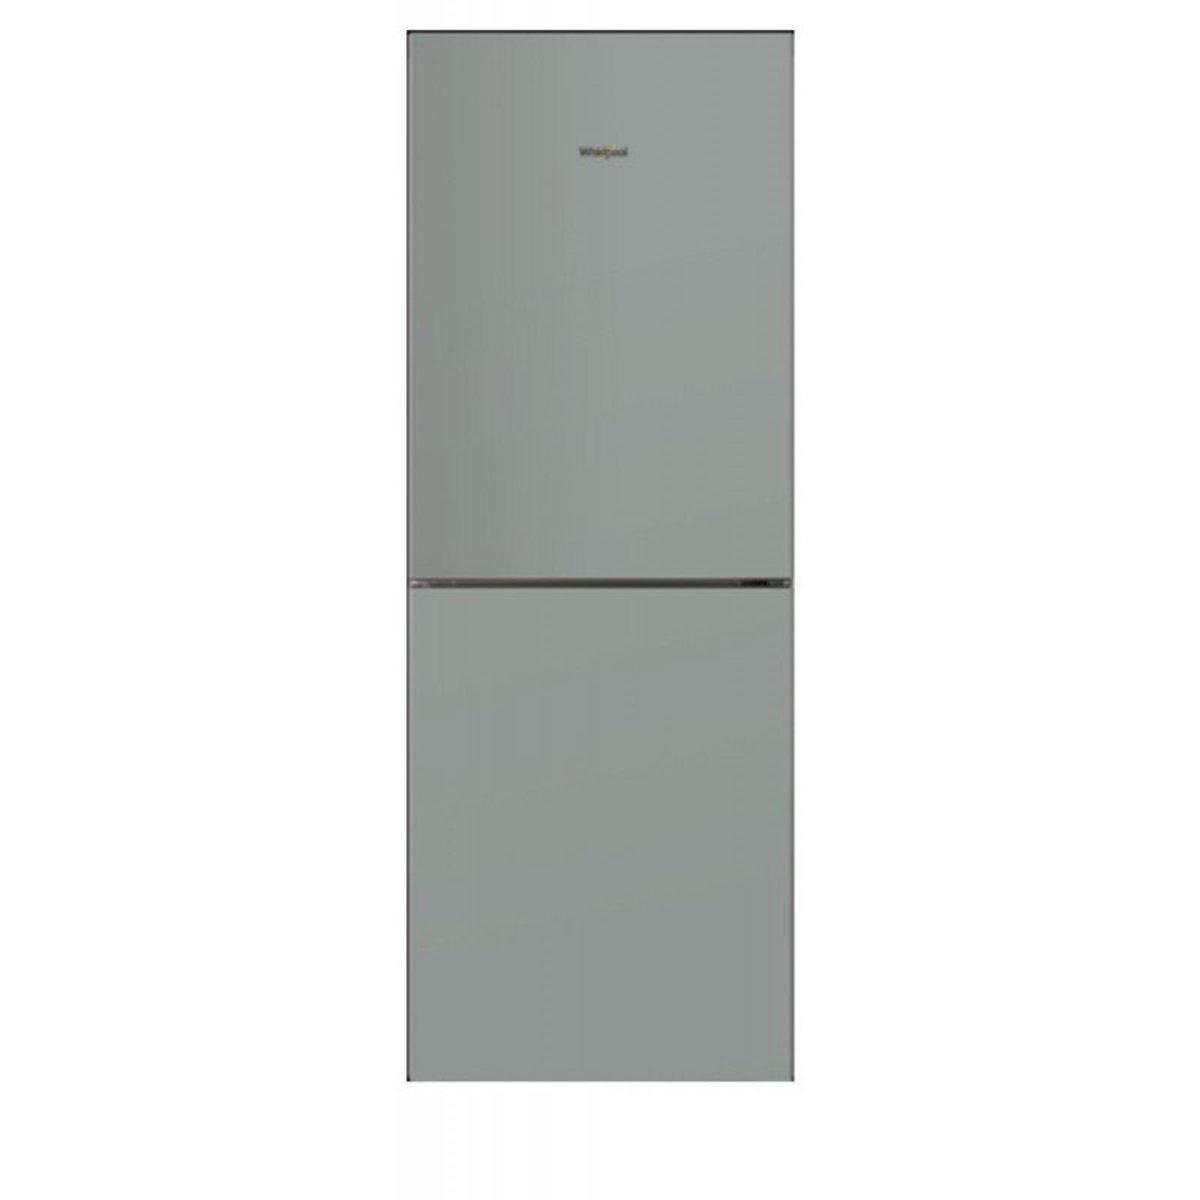 Whirlpool WF2B281LPS Refrigerator Platinum-Silver